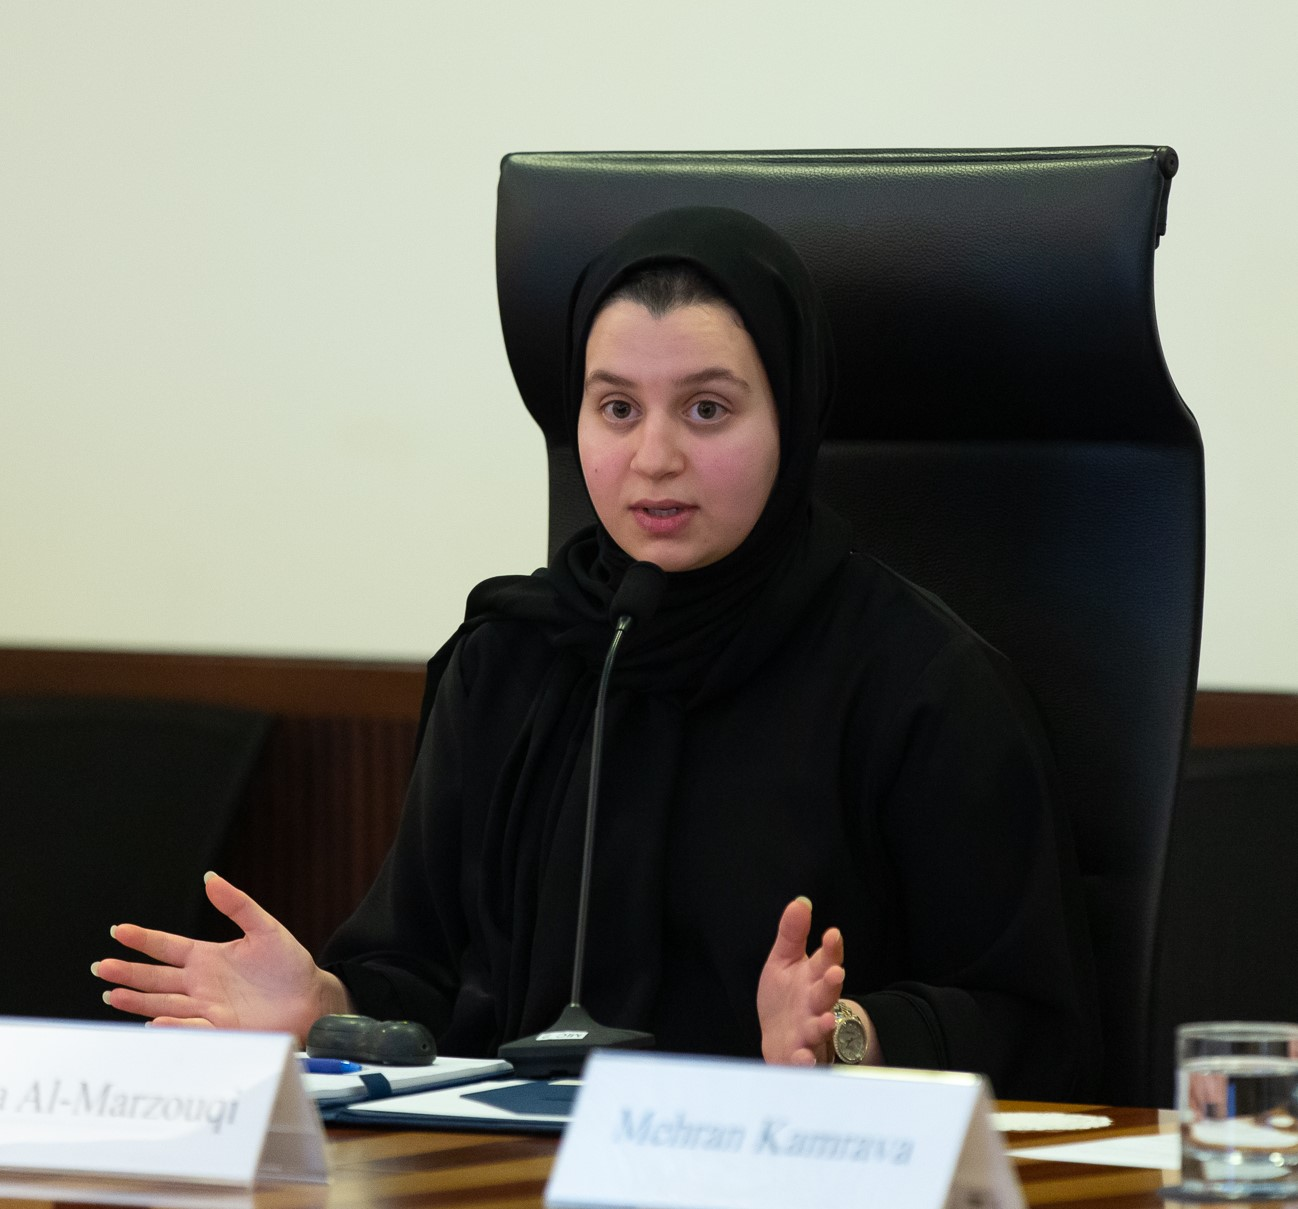 Access Denied: Banning Qatari Ships from Blockading States